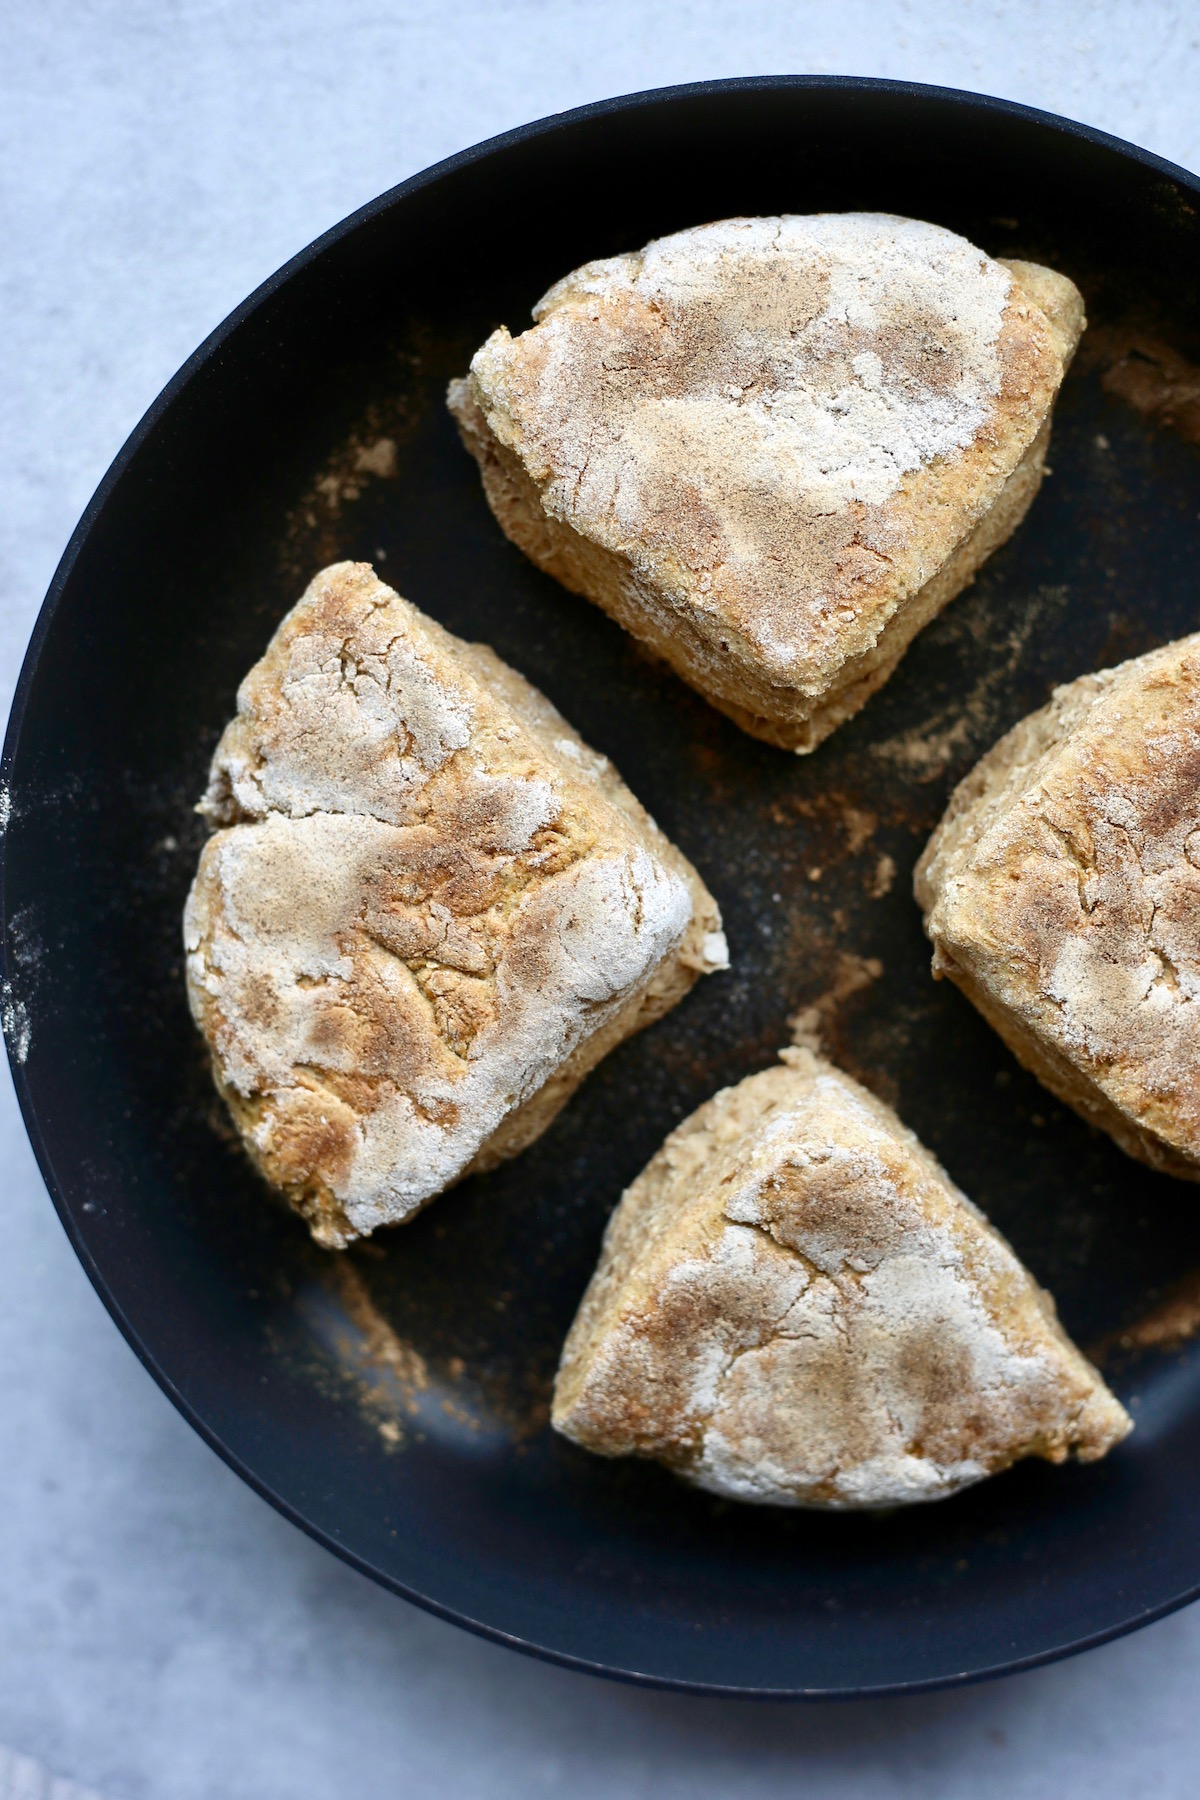 4 vegan Irish soda farls cooking on a hot skillet until golden brown